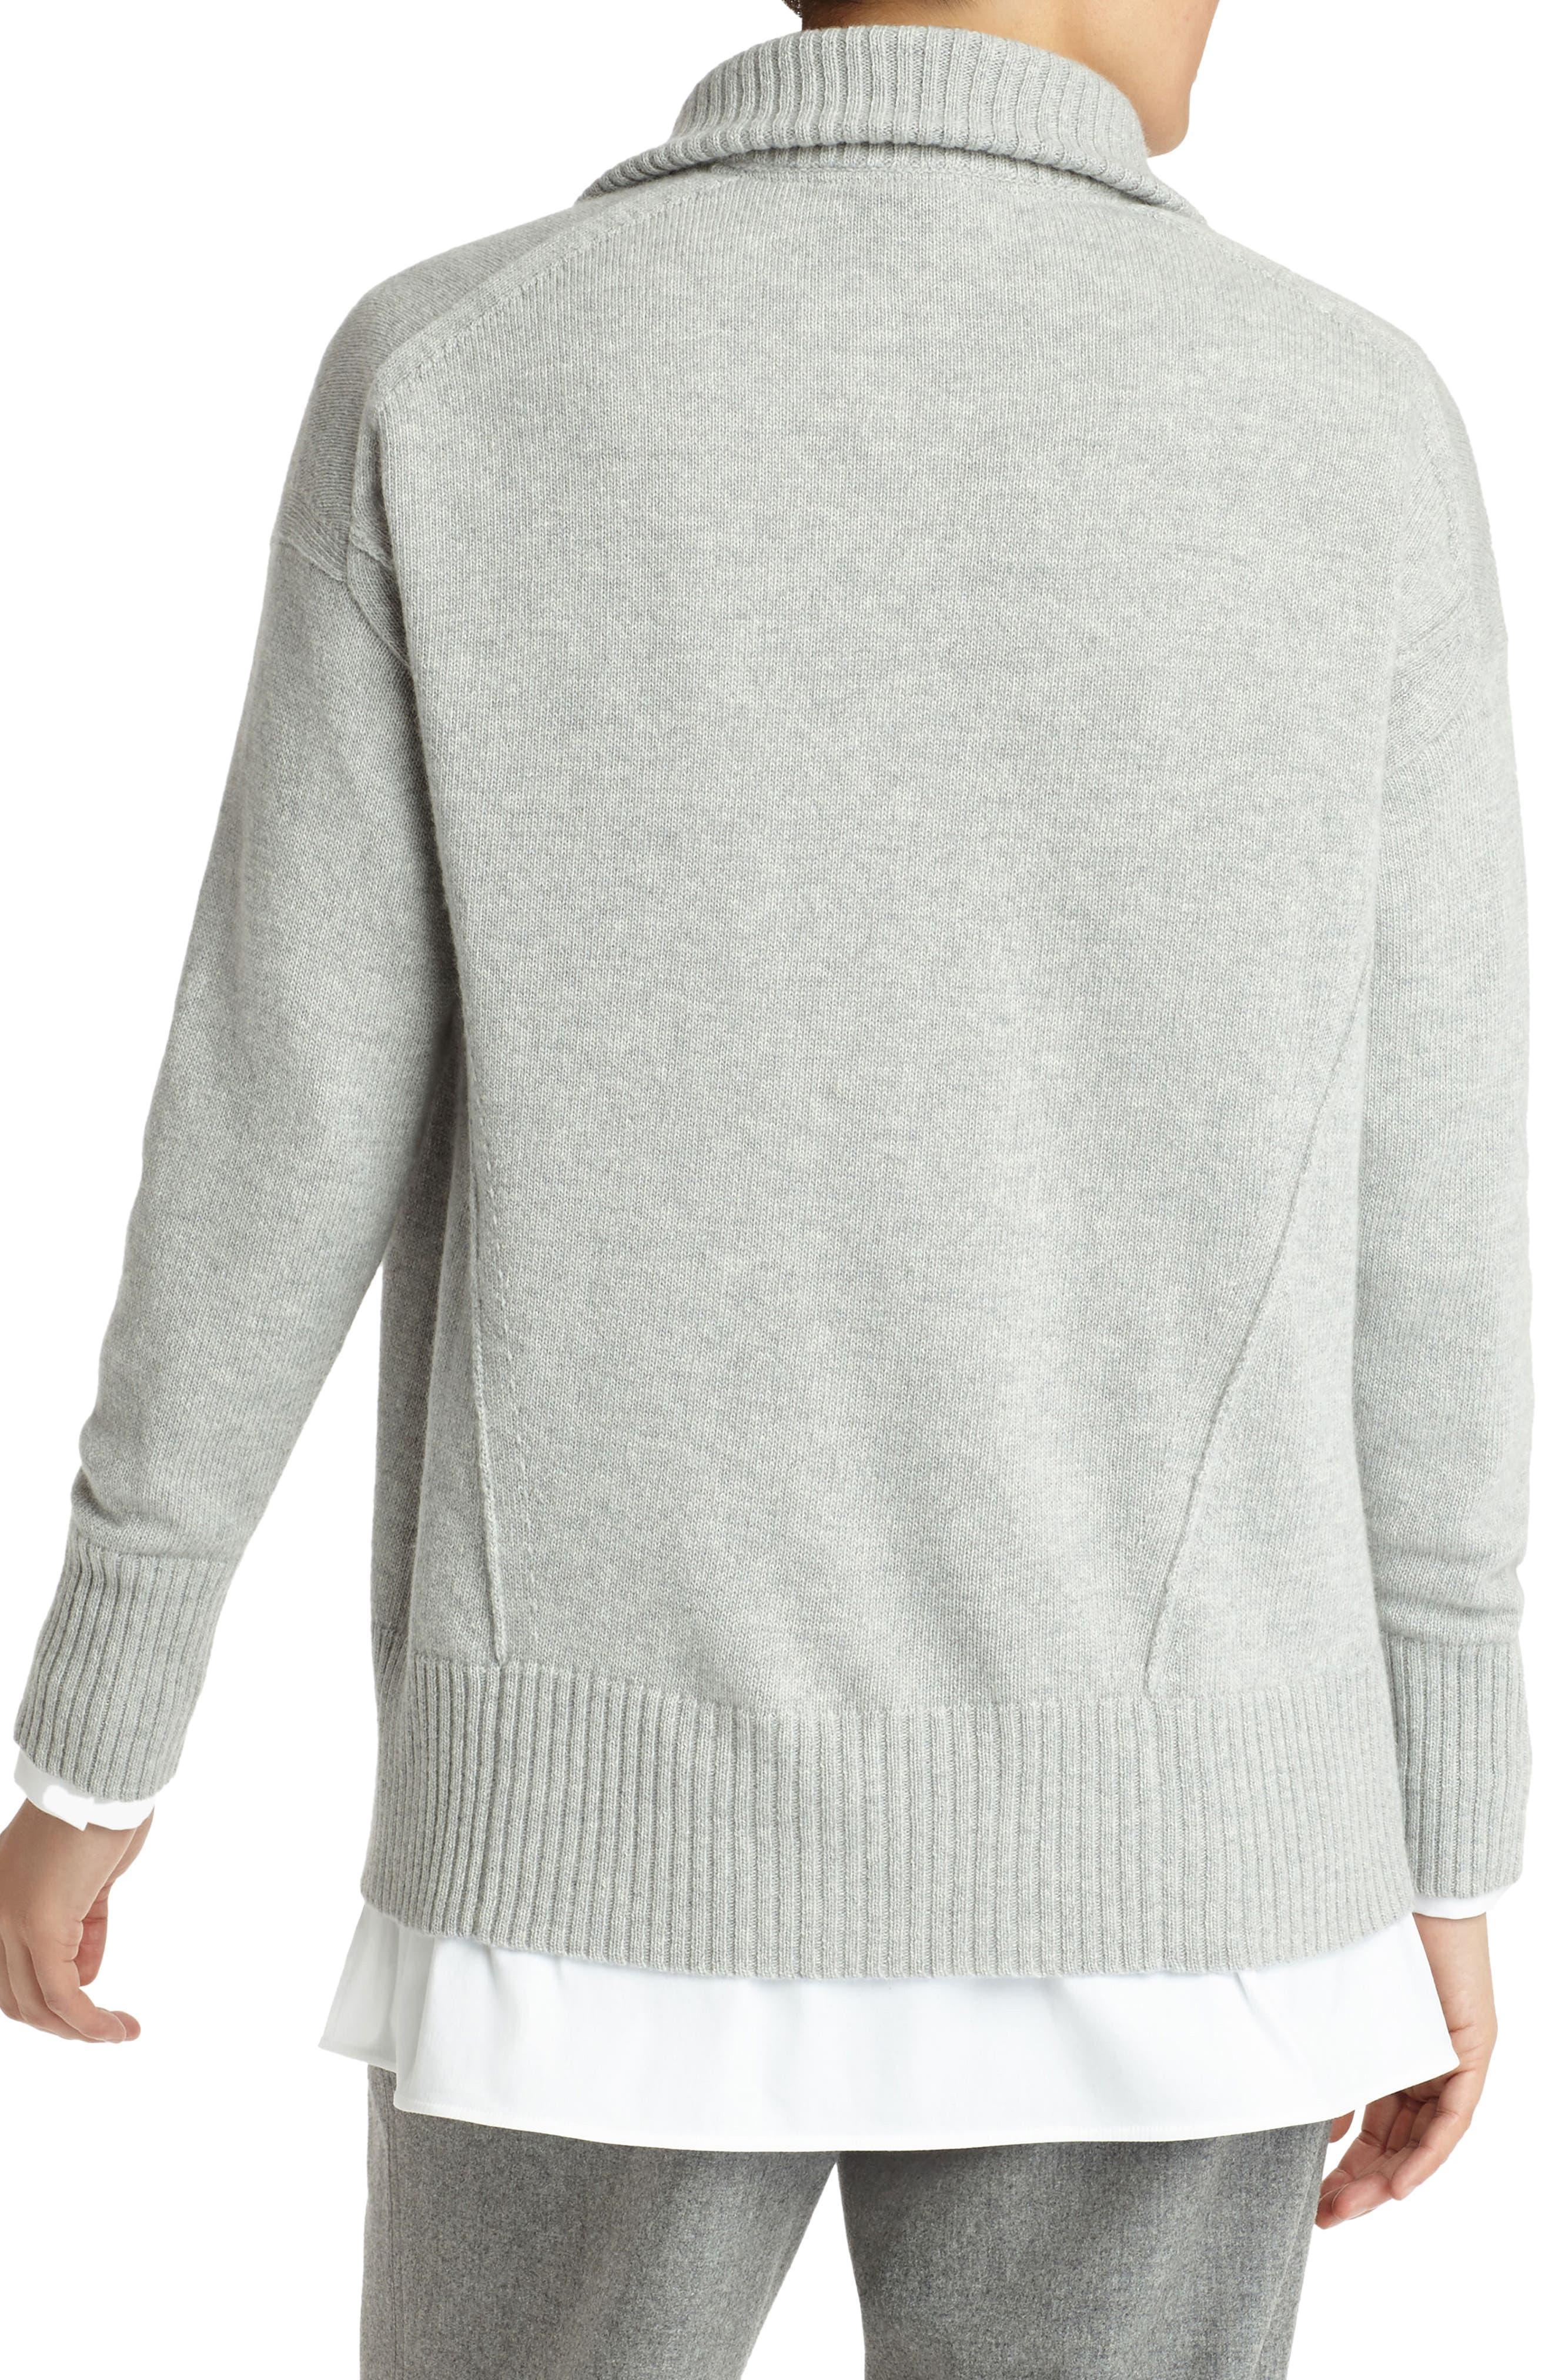 Alternate Image 2  - Lafayette 148 New York Luxe Merino Wool & Cashmere Sweater Jacket